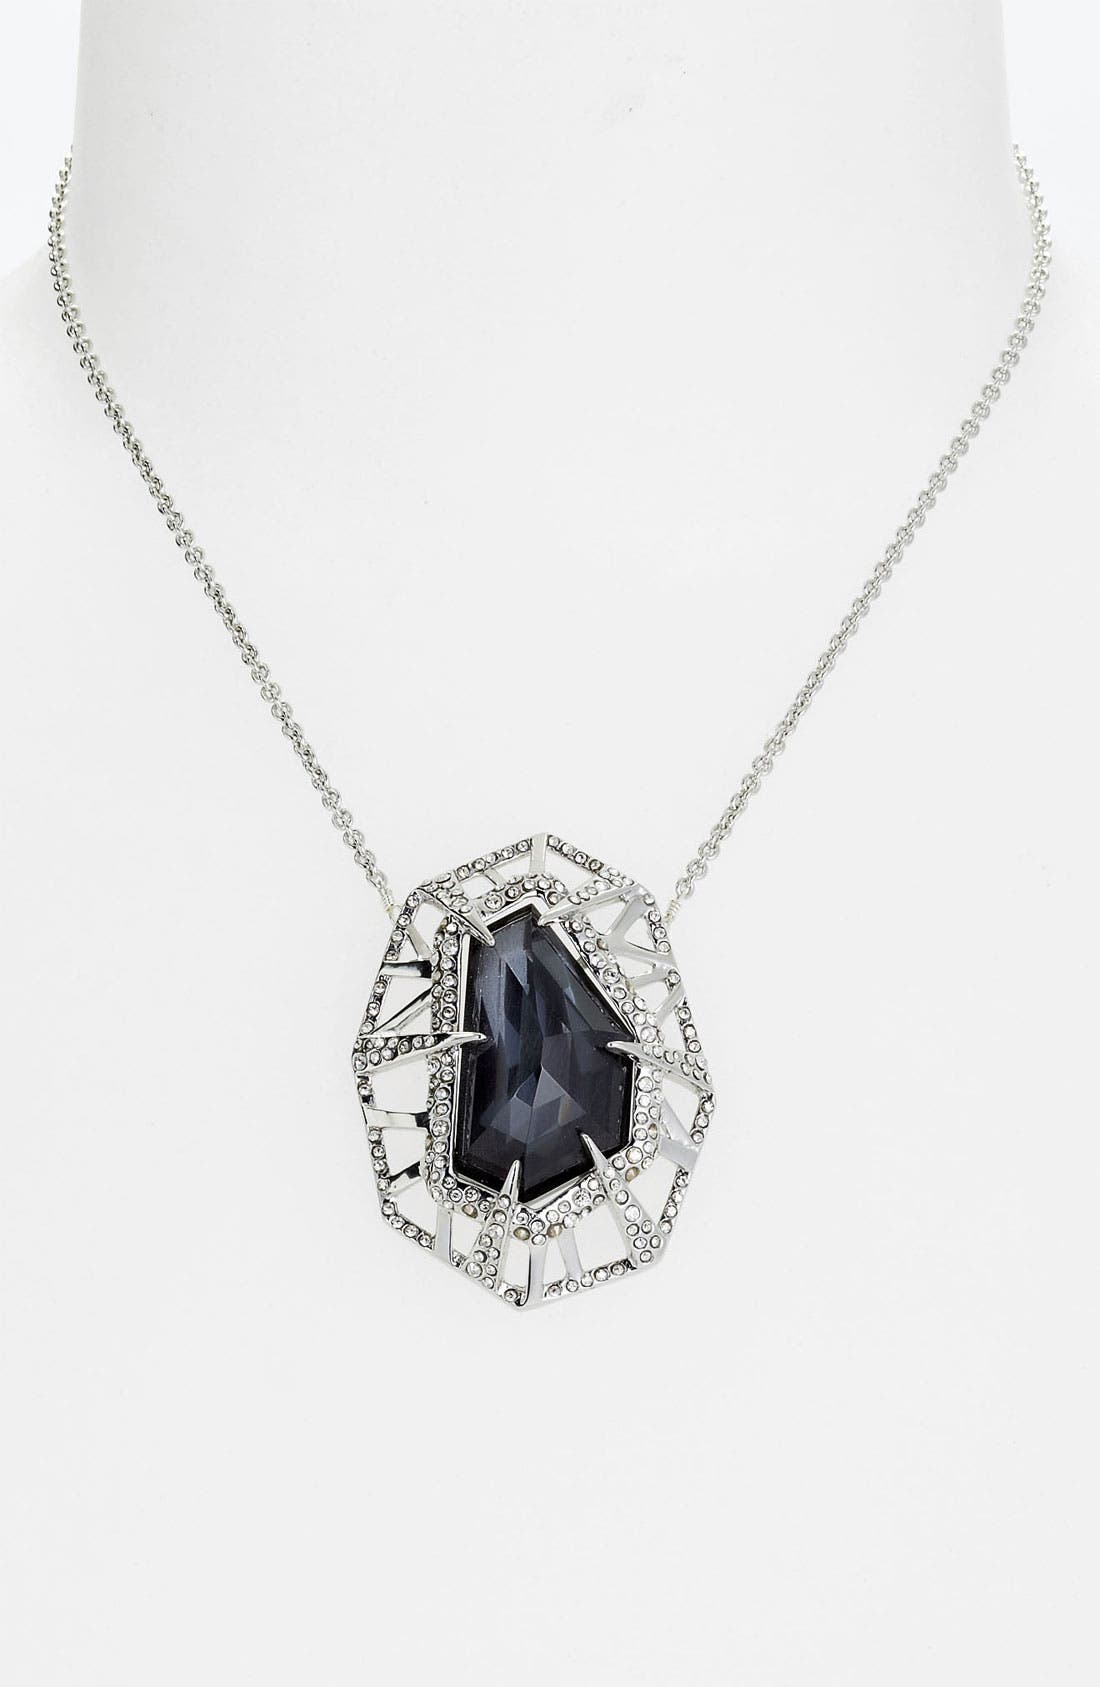 Alternate Image 1 Selected - Alexis Bittar 'Miss Havisham - Delano' Pendant Necklace